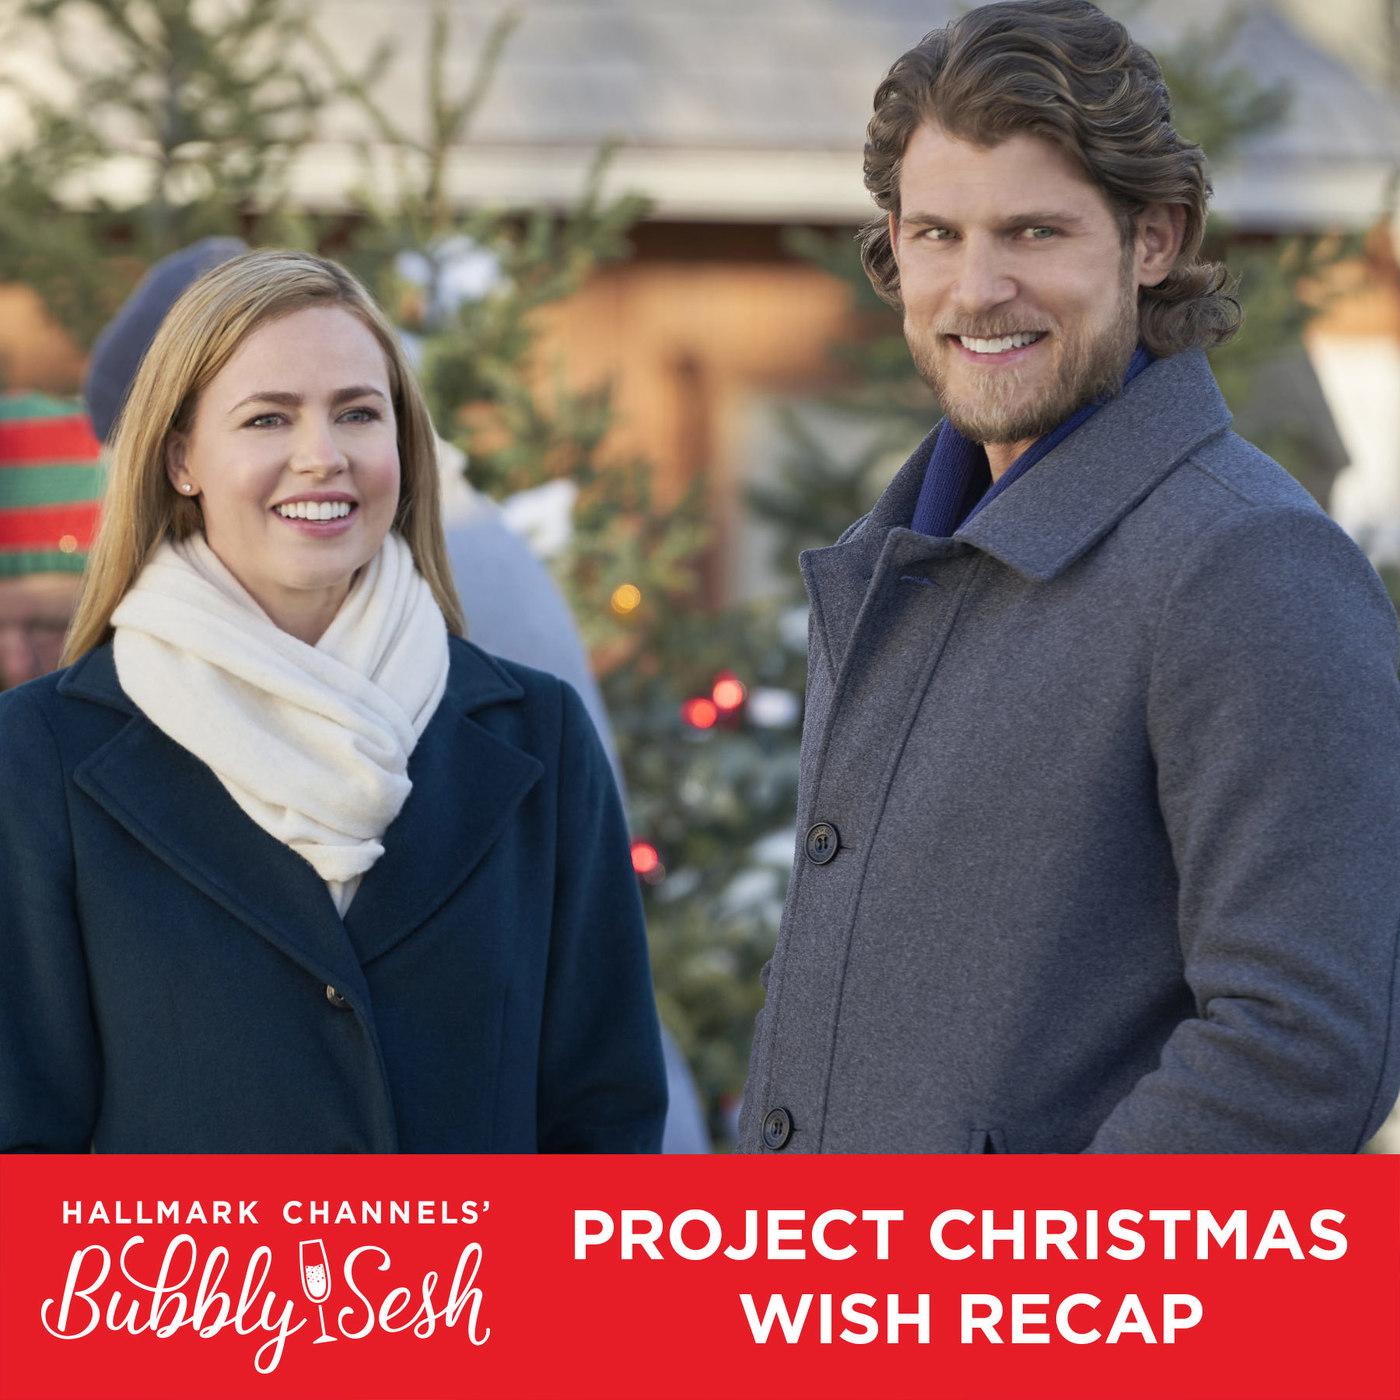 Project Christmas Wish Recap